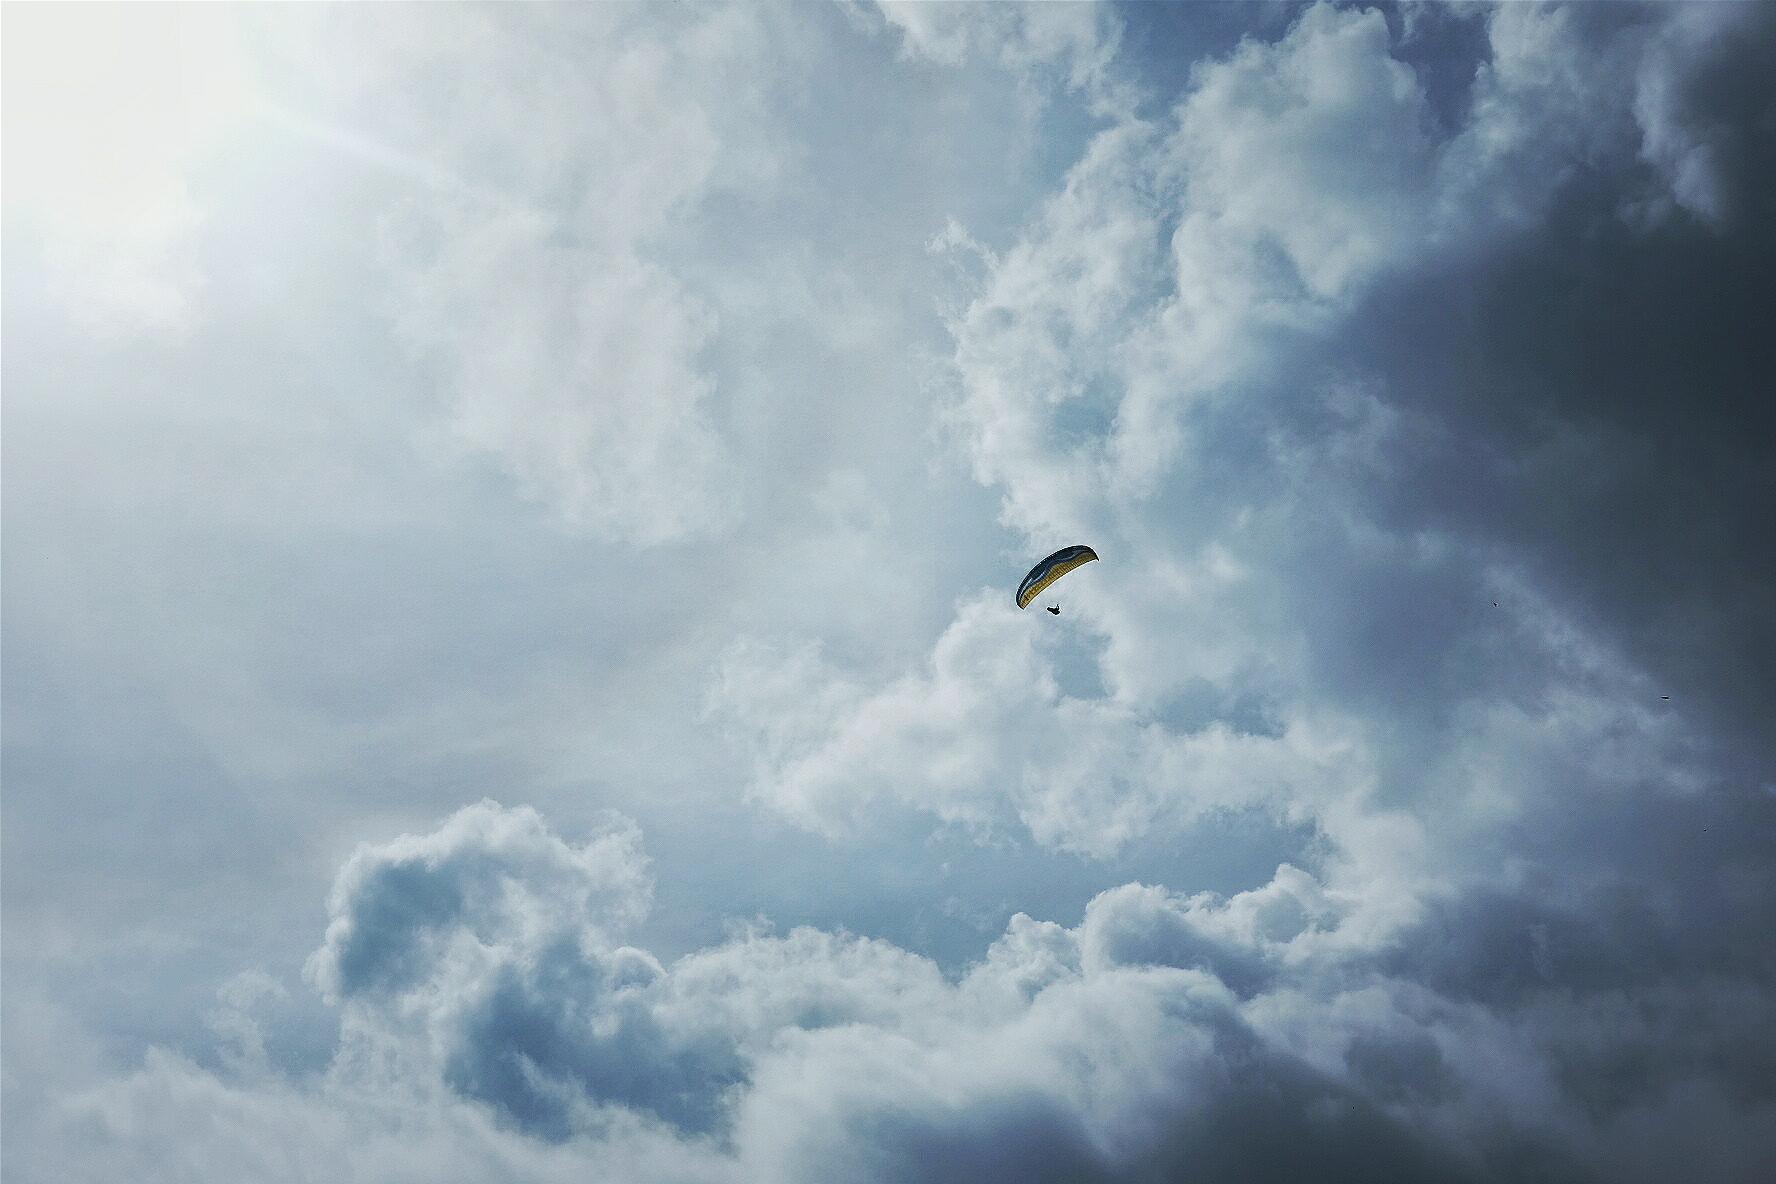 Sportive Louis Caput 2016 by Ivan Blanco - Paraglider Icarus Sky Blue Sun Cycling Landscape France Gourdon South Provence